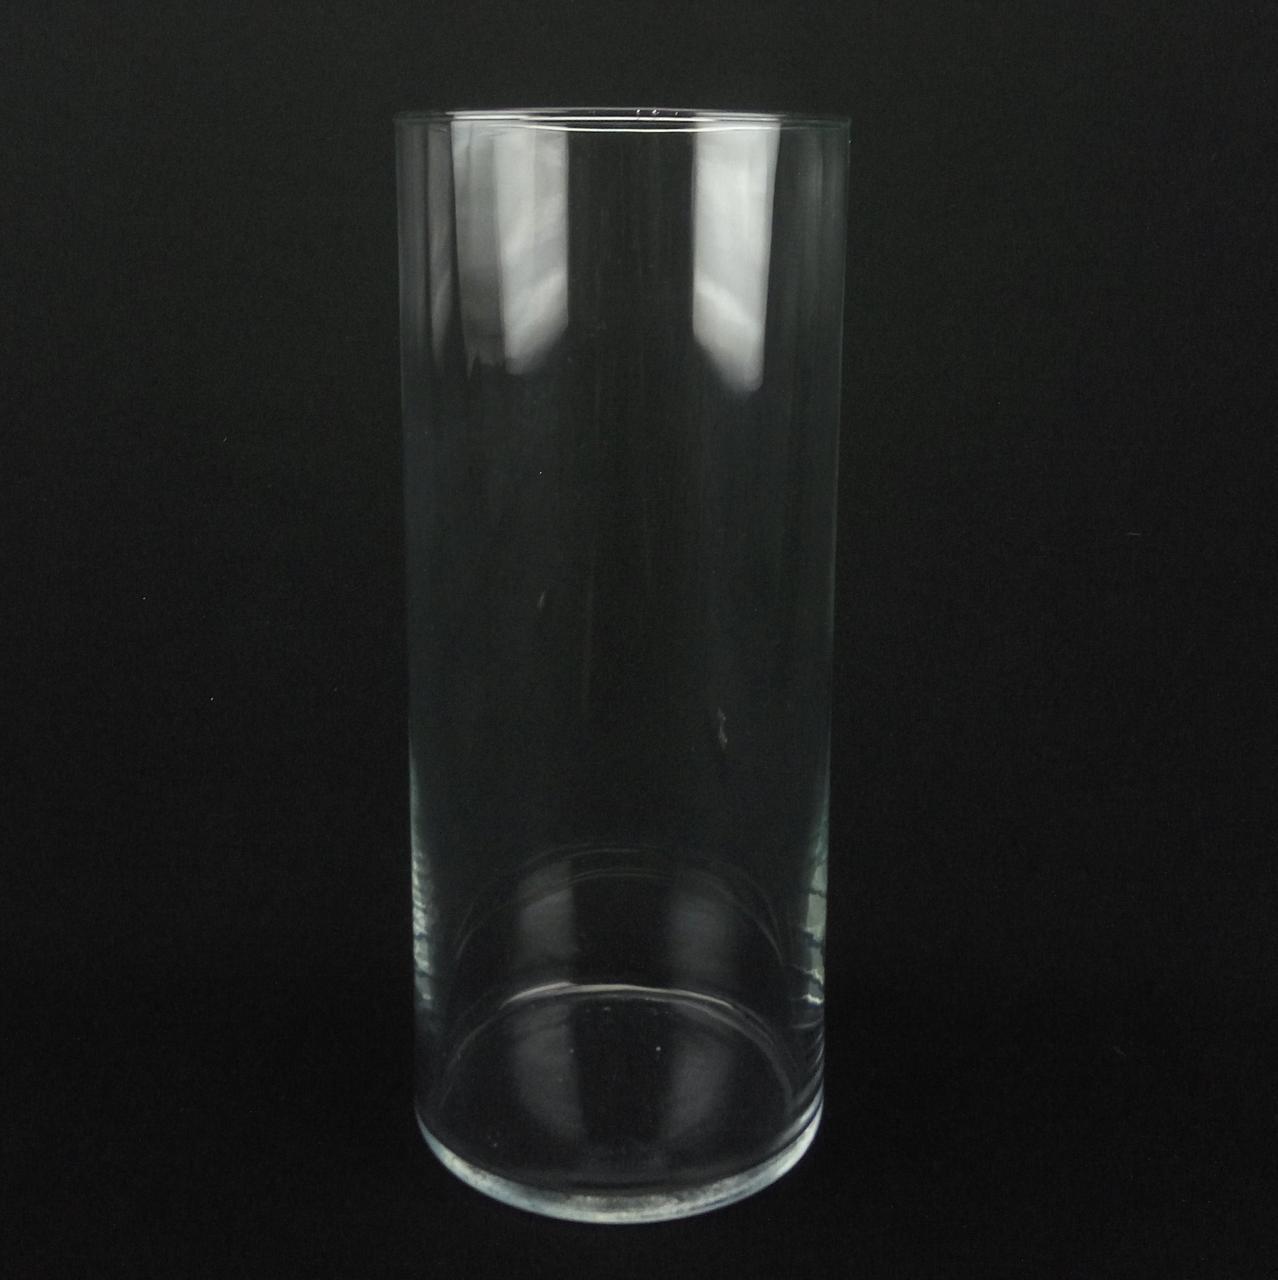 Подсвечник h 26 см, Ø 11 см, колба